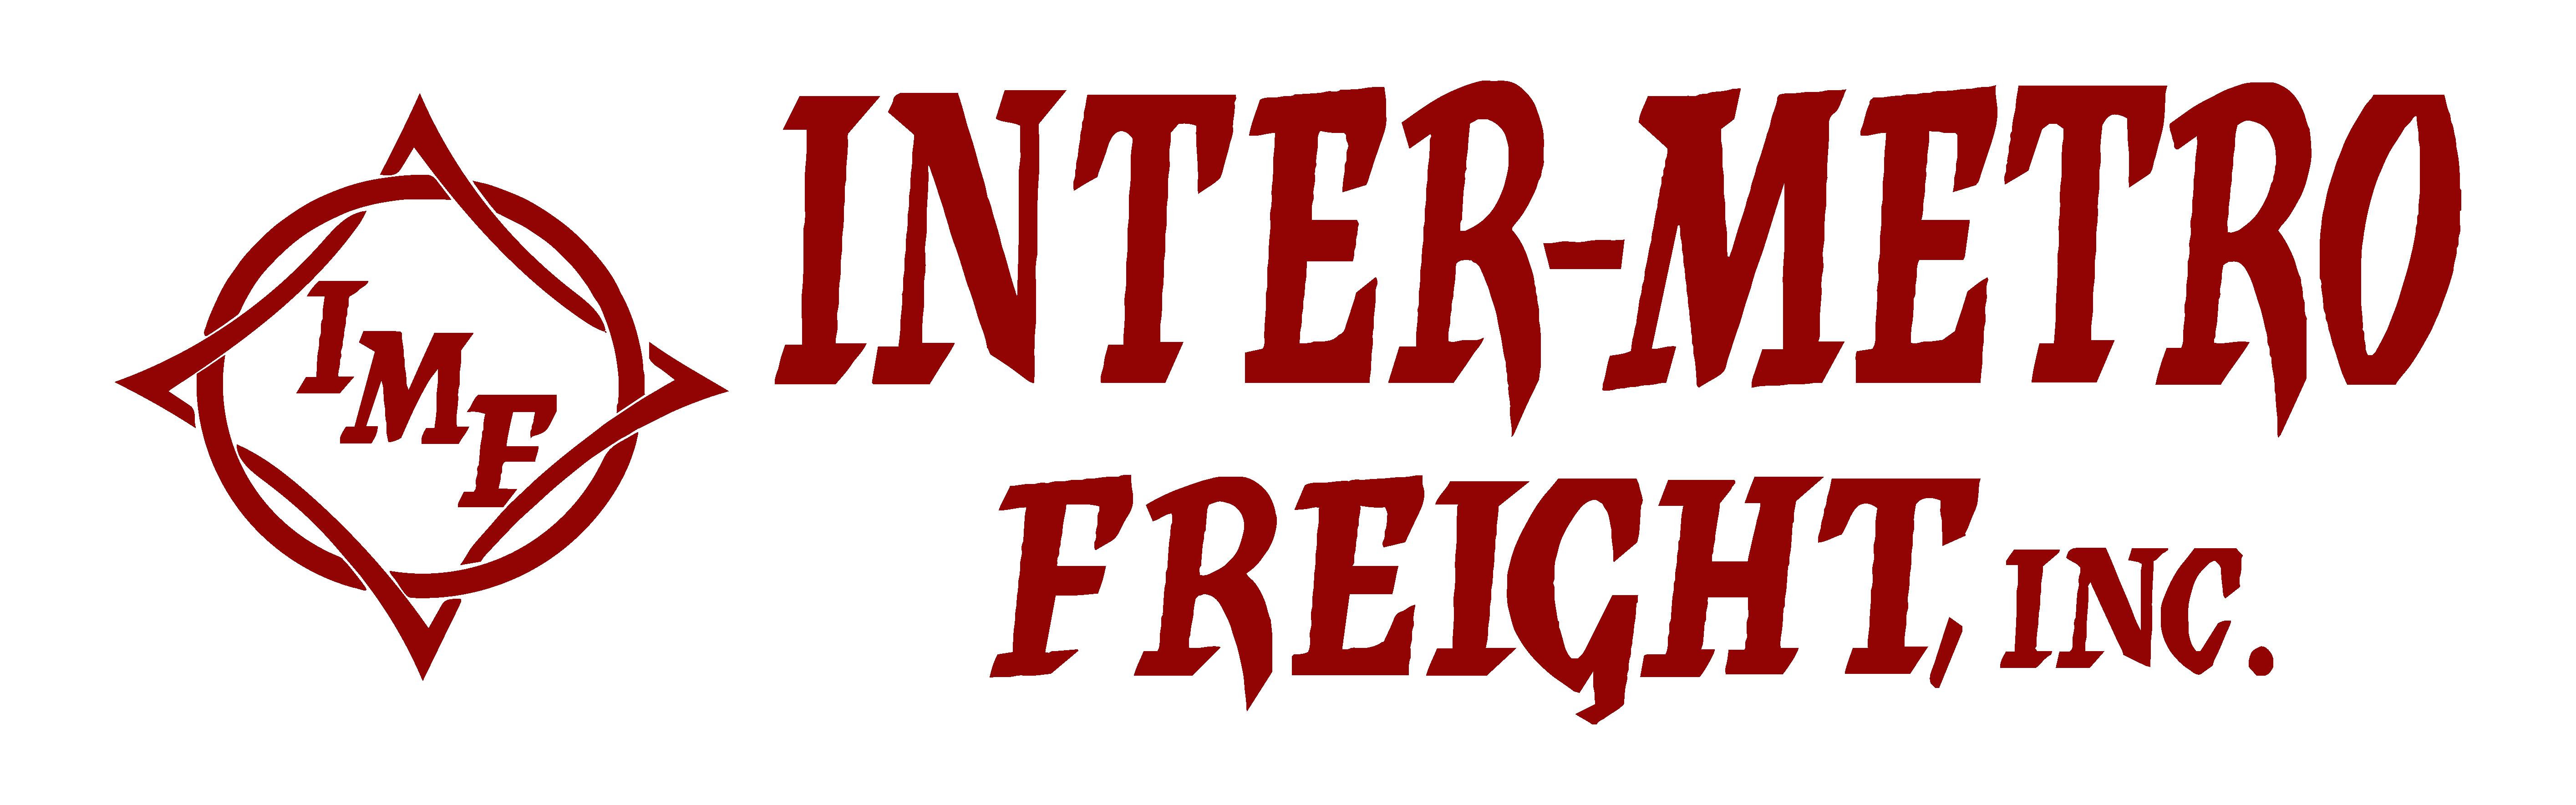 Inter Metro Freight